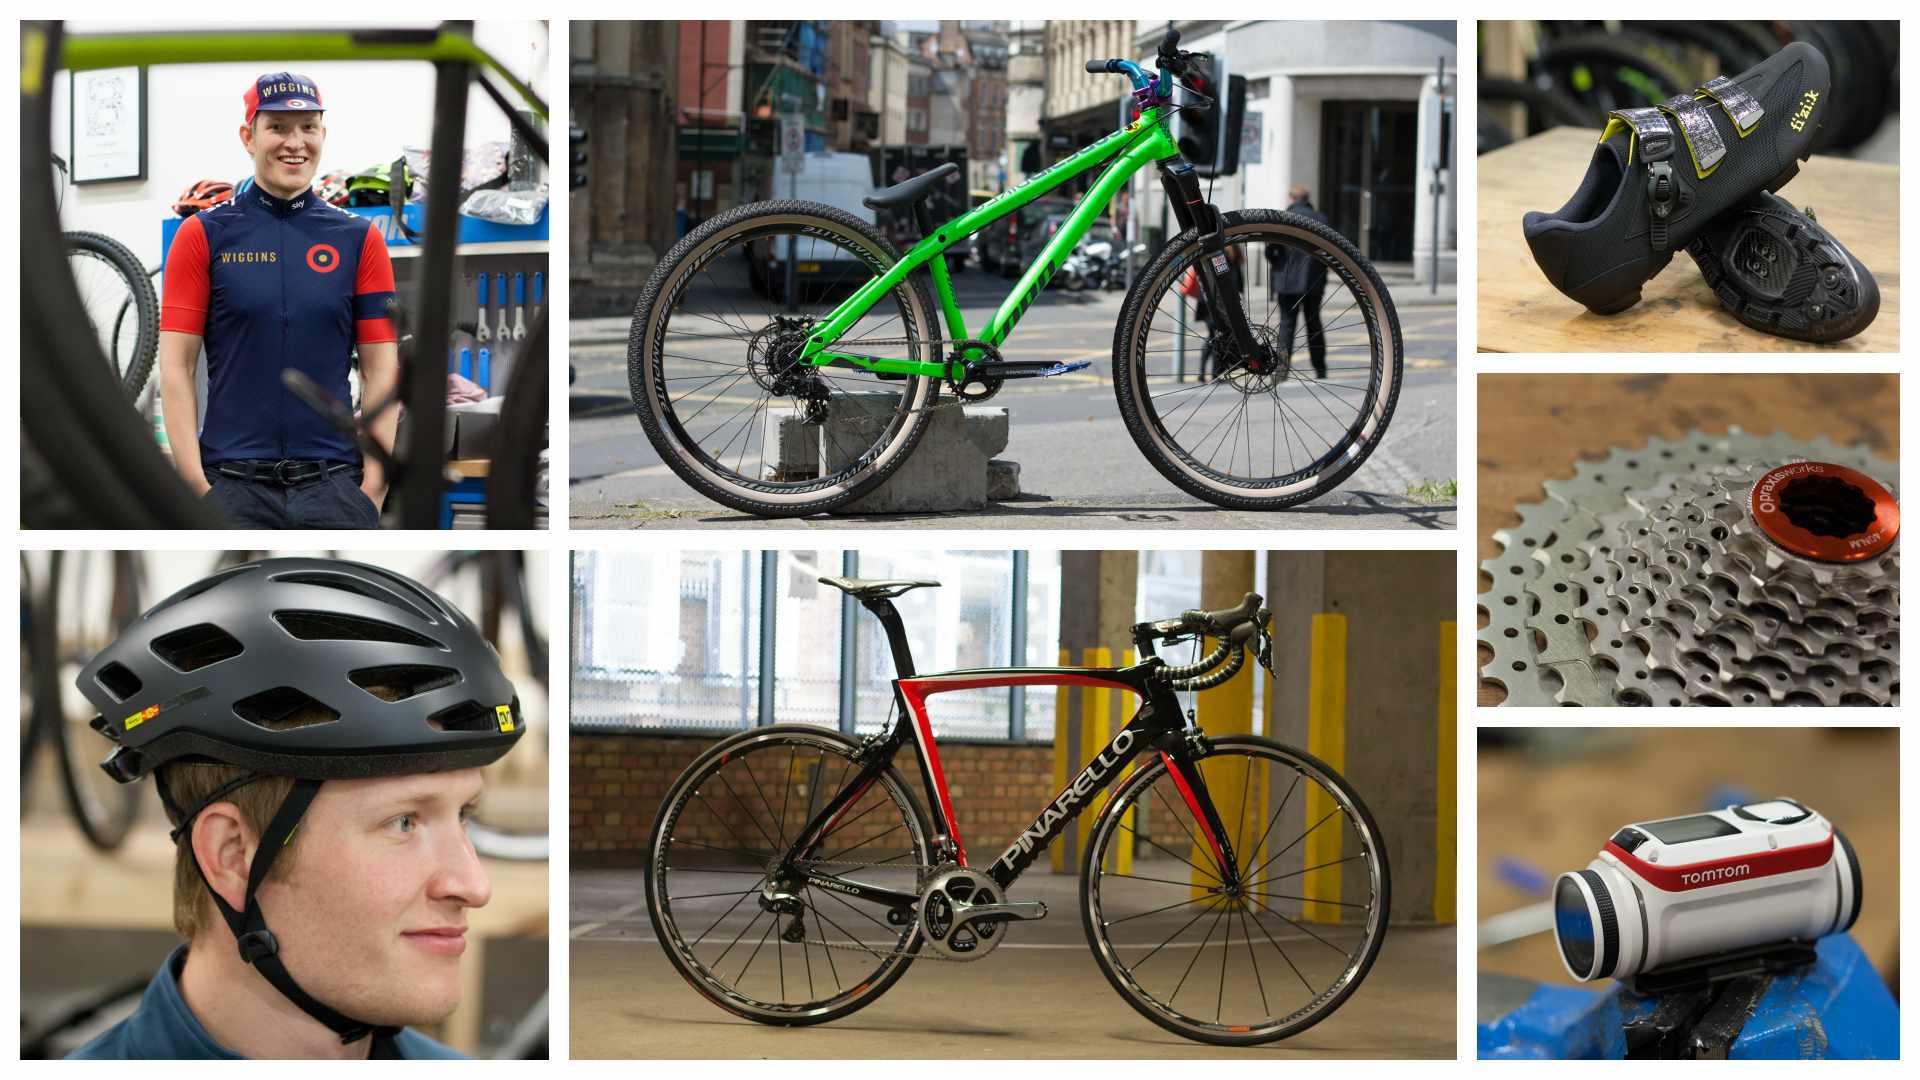 This week's best bike gear